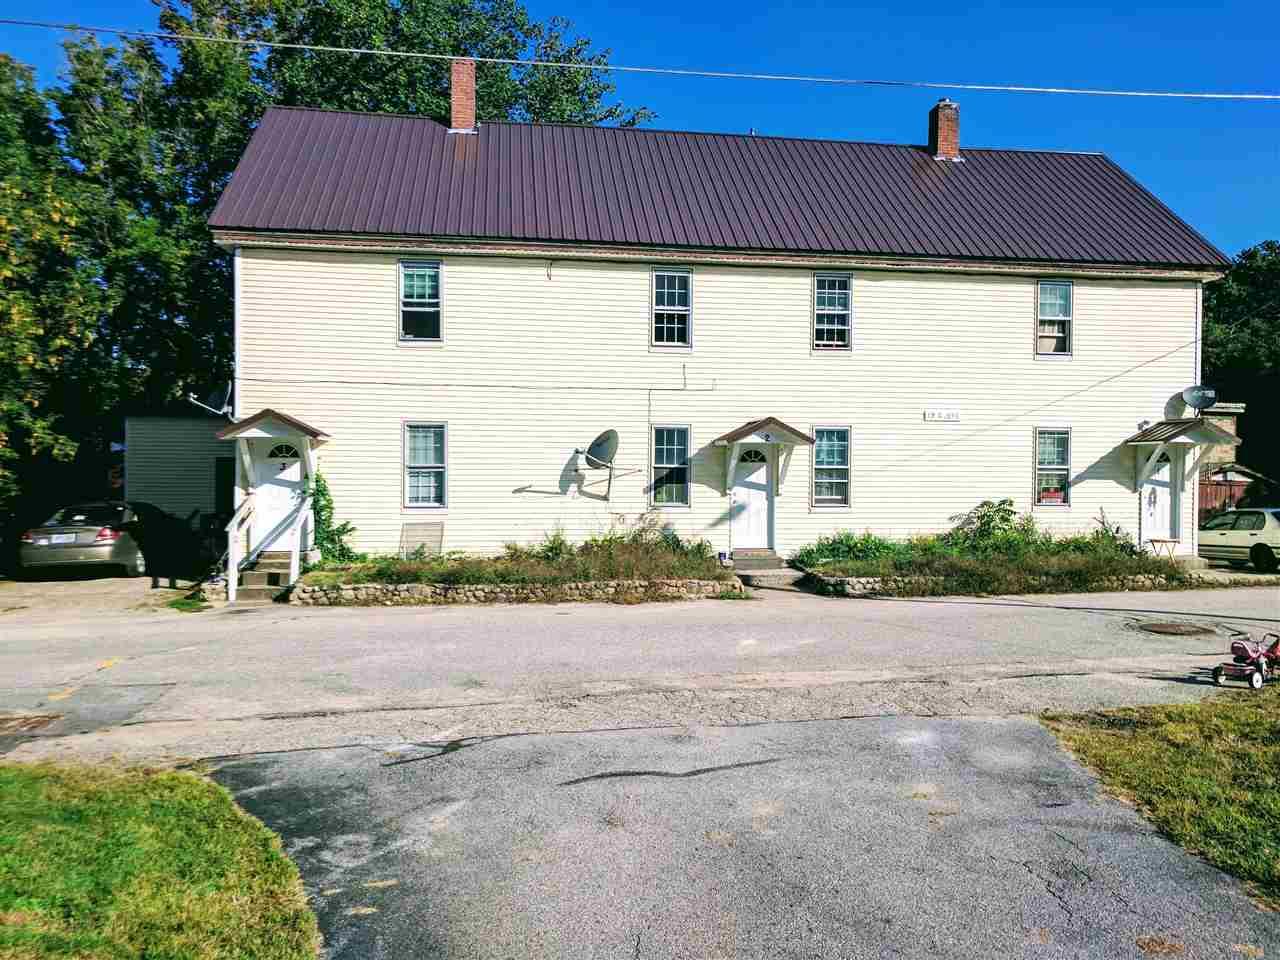 ASHLAND NHMulti Family Homes for sale